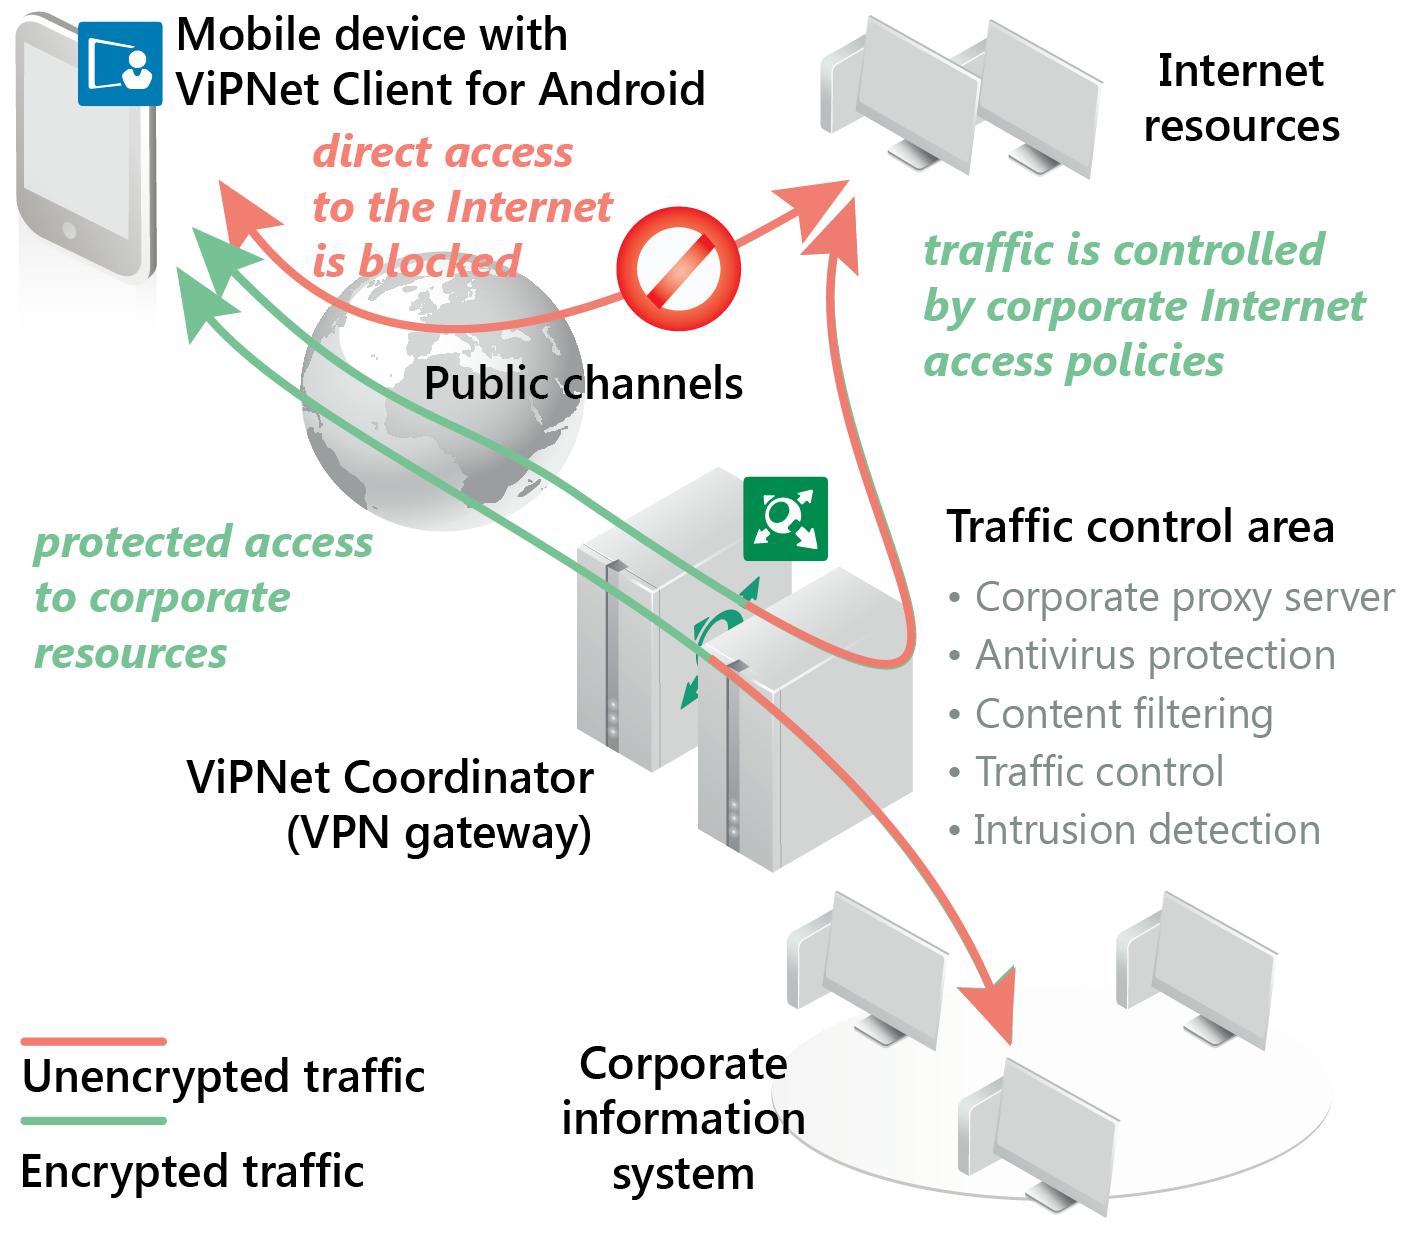 Secure Cyber Circuits - ViPNet Client More Details